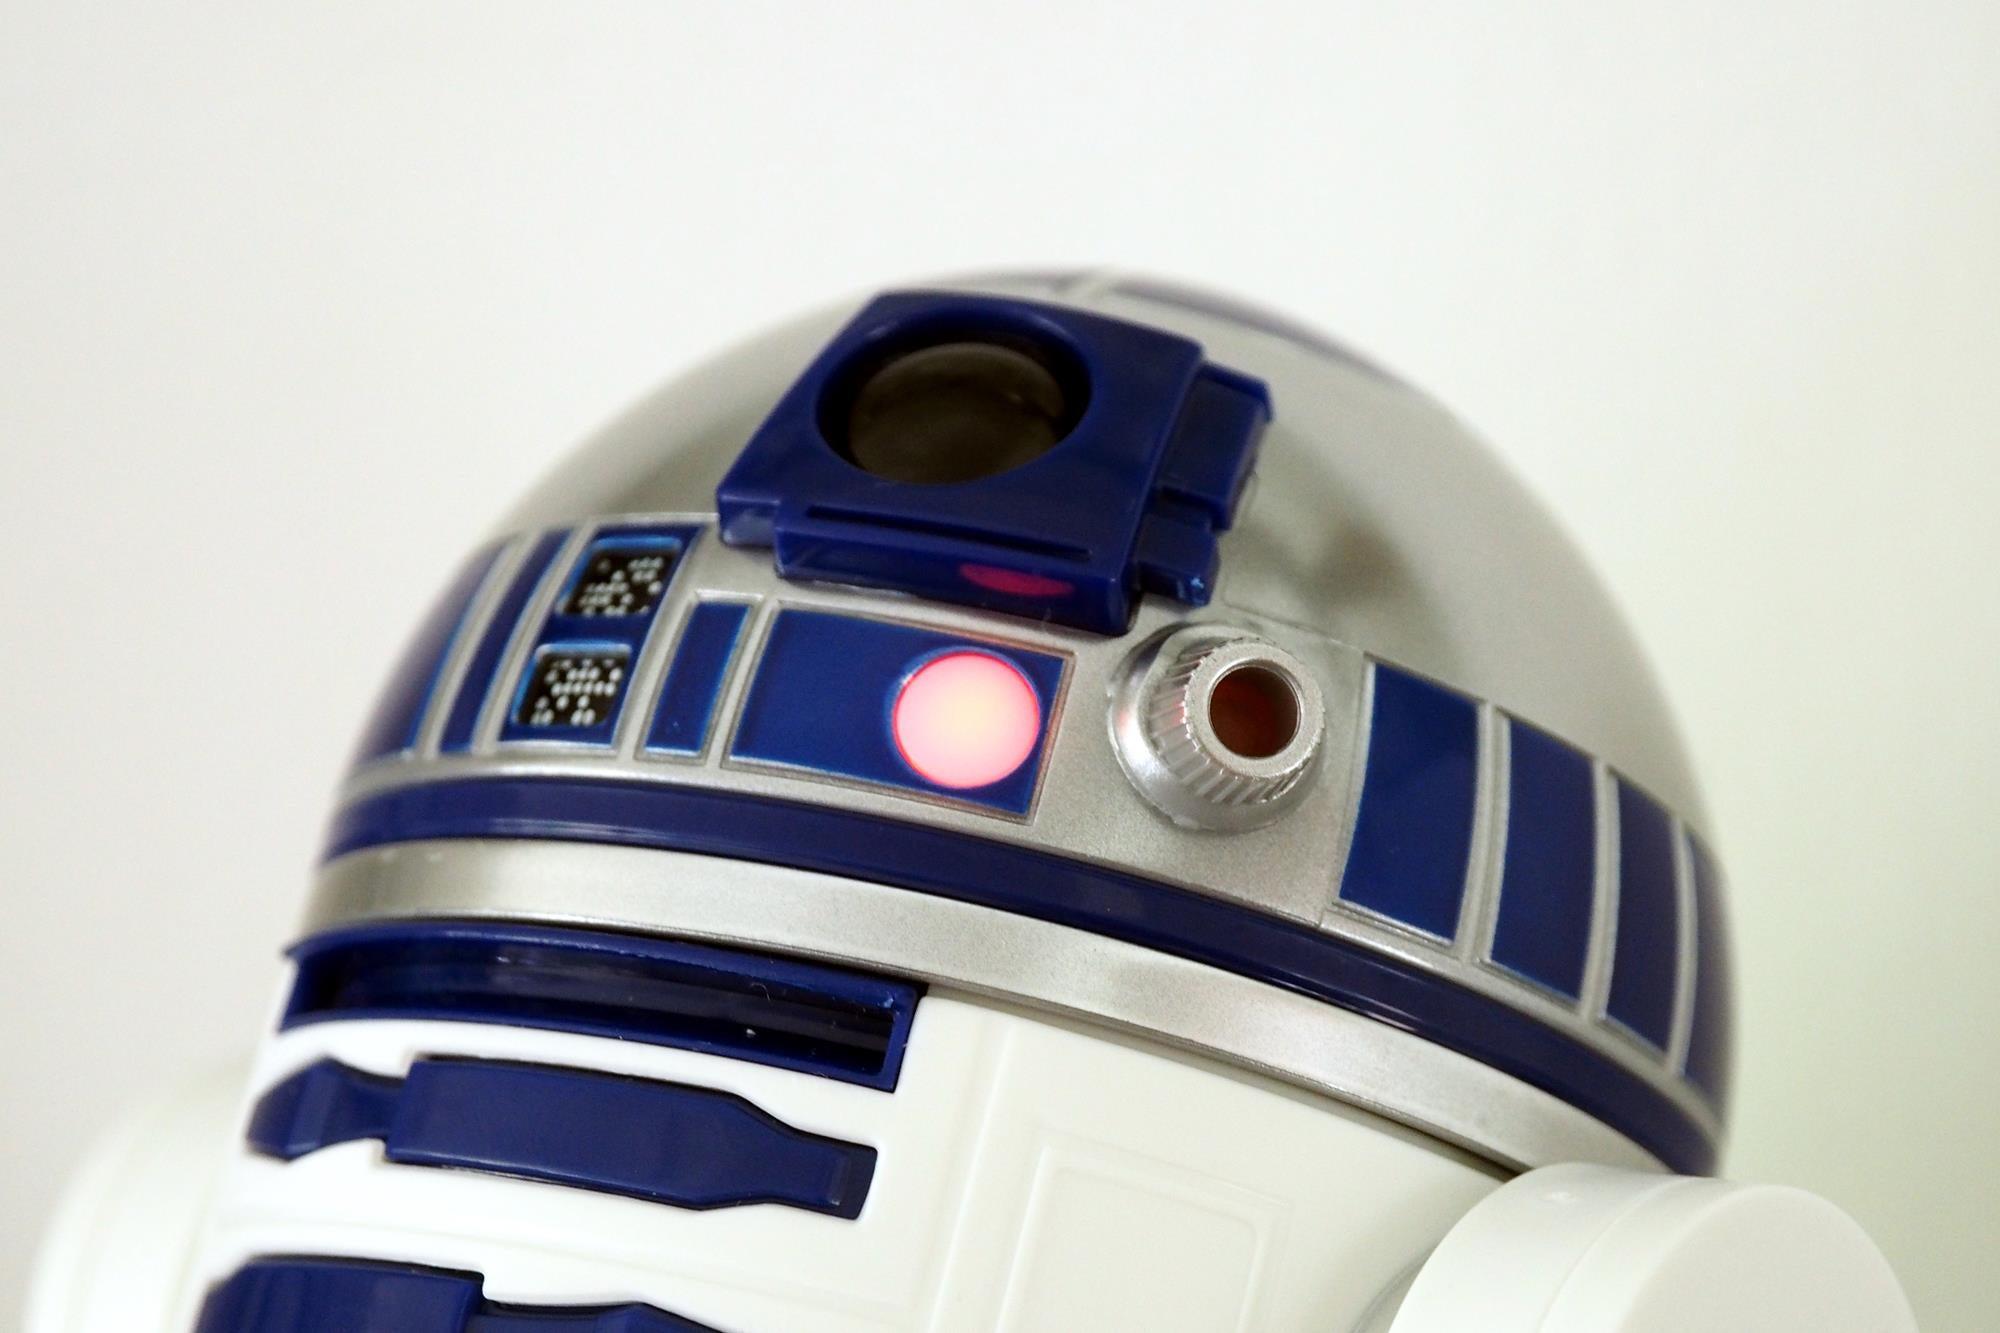 sphero r2 d2 review trusted reviews rh trustedreviews com Verizon Motorola Android Phones R2-D2 Droid Phone